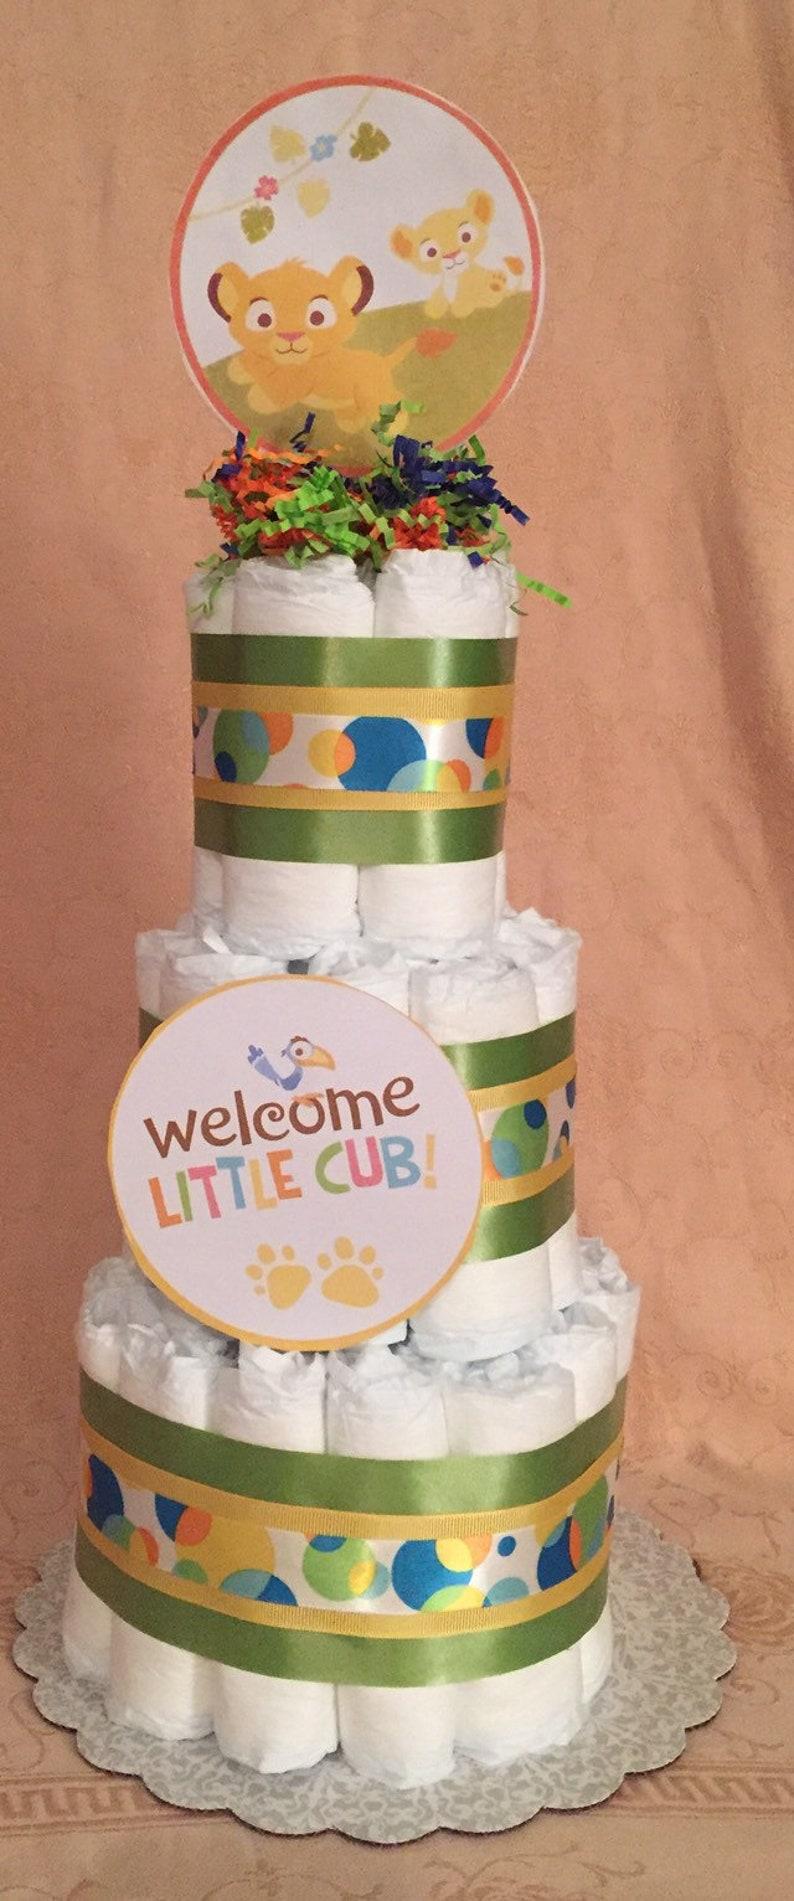 3 Tier Diaper Cake Walt Disney MICKEY MOUSE Baby Shower Centerpiece